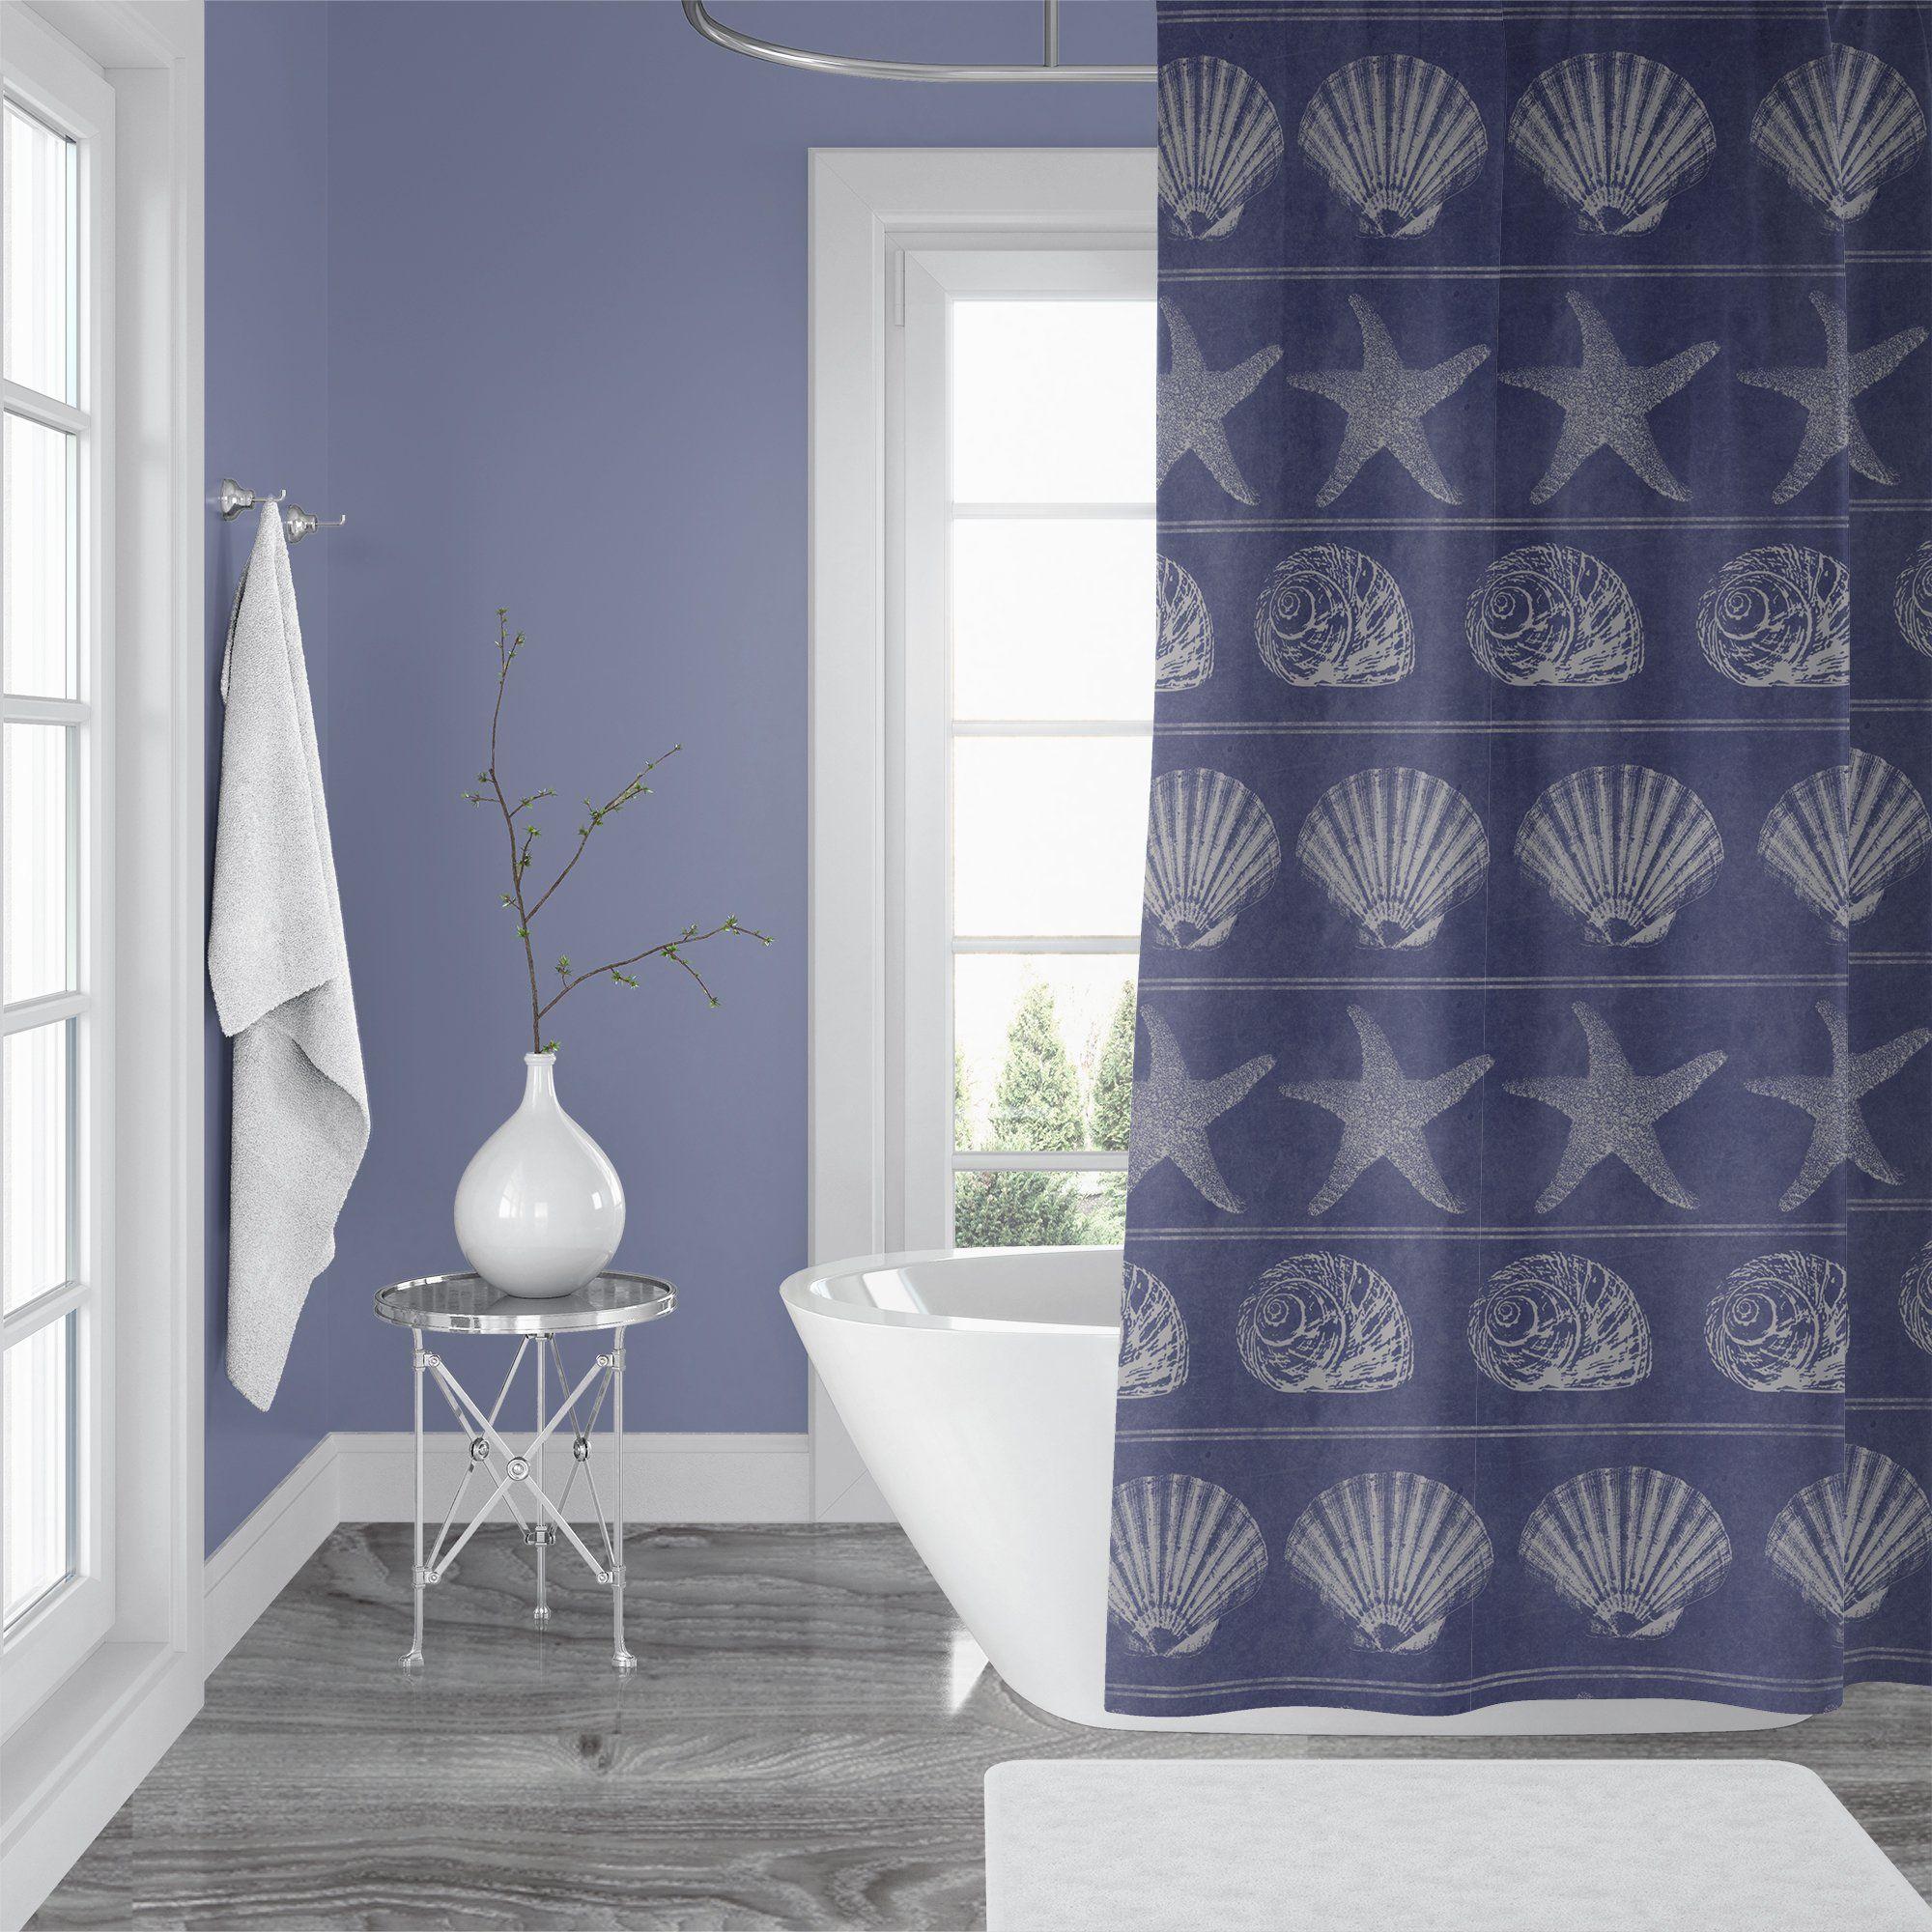 Periwinkle Blue Beach House Bathroom Shell Shower Curtain